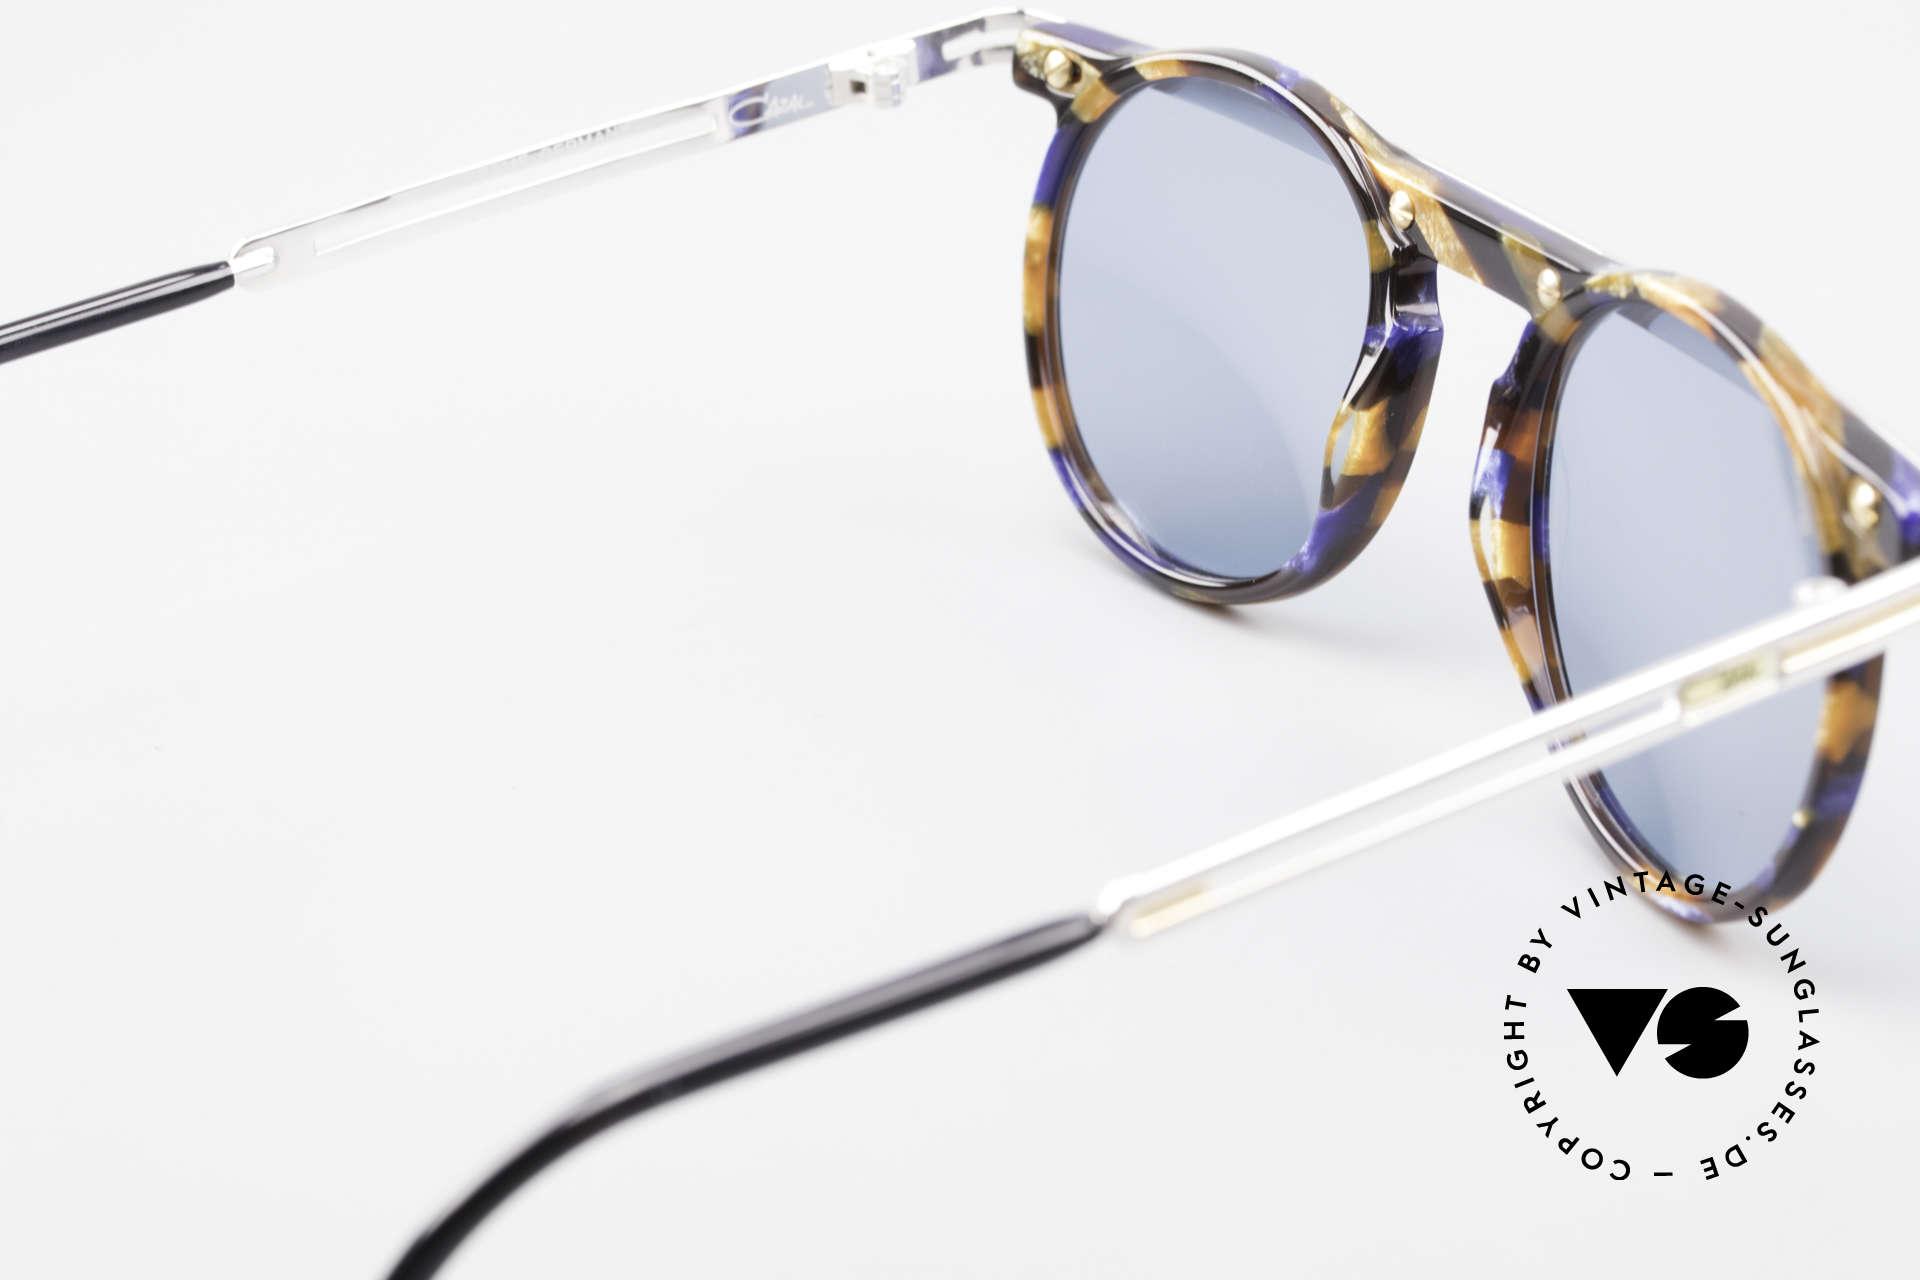 Cazal 648 Old Cari Zalloni Sunglasses, NO RETRO EYEWEAR, but a 29 years old ORIGINAL!, Made for Men and Women